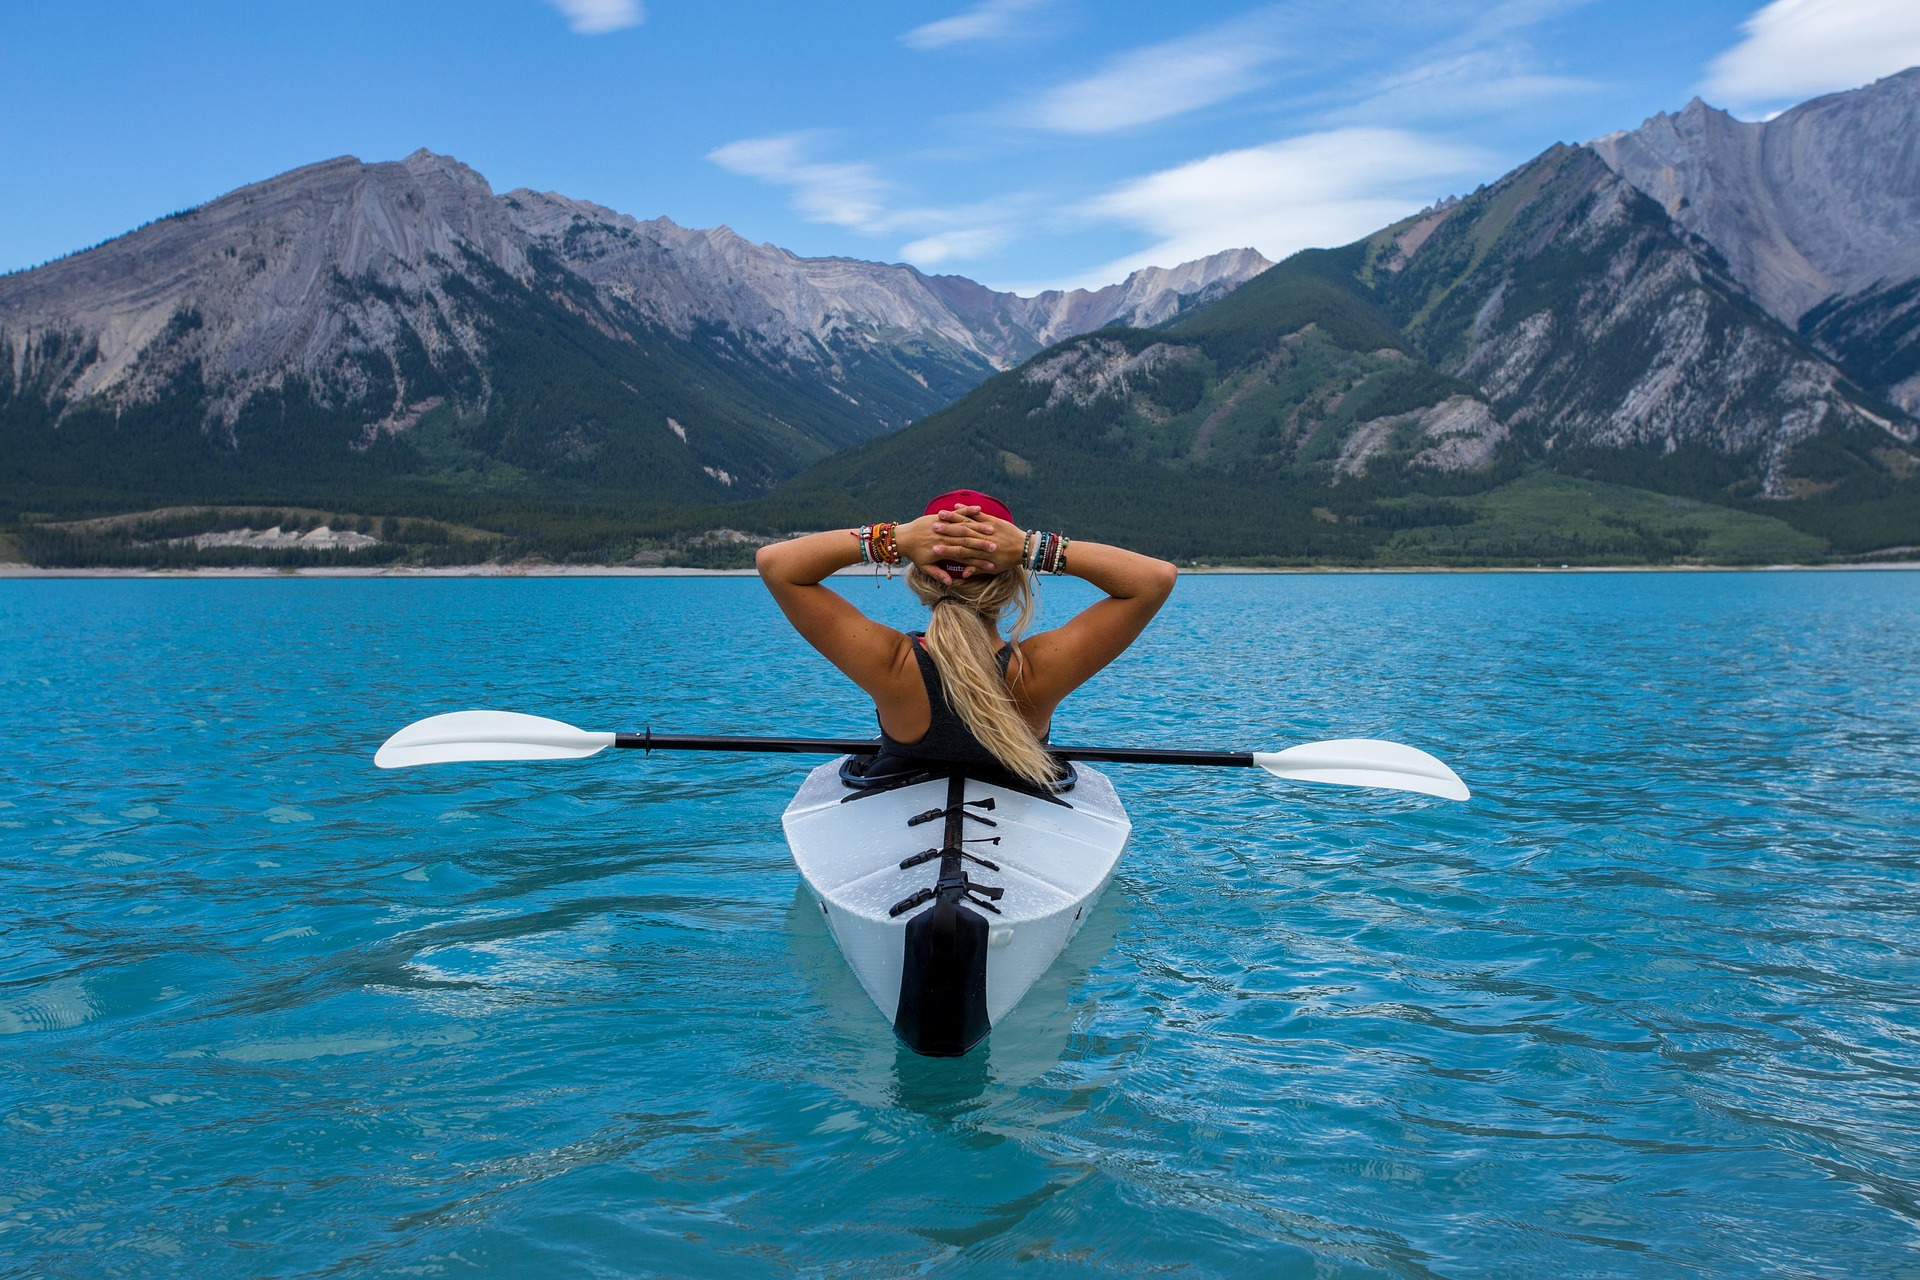 kayak made for catching fish